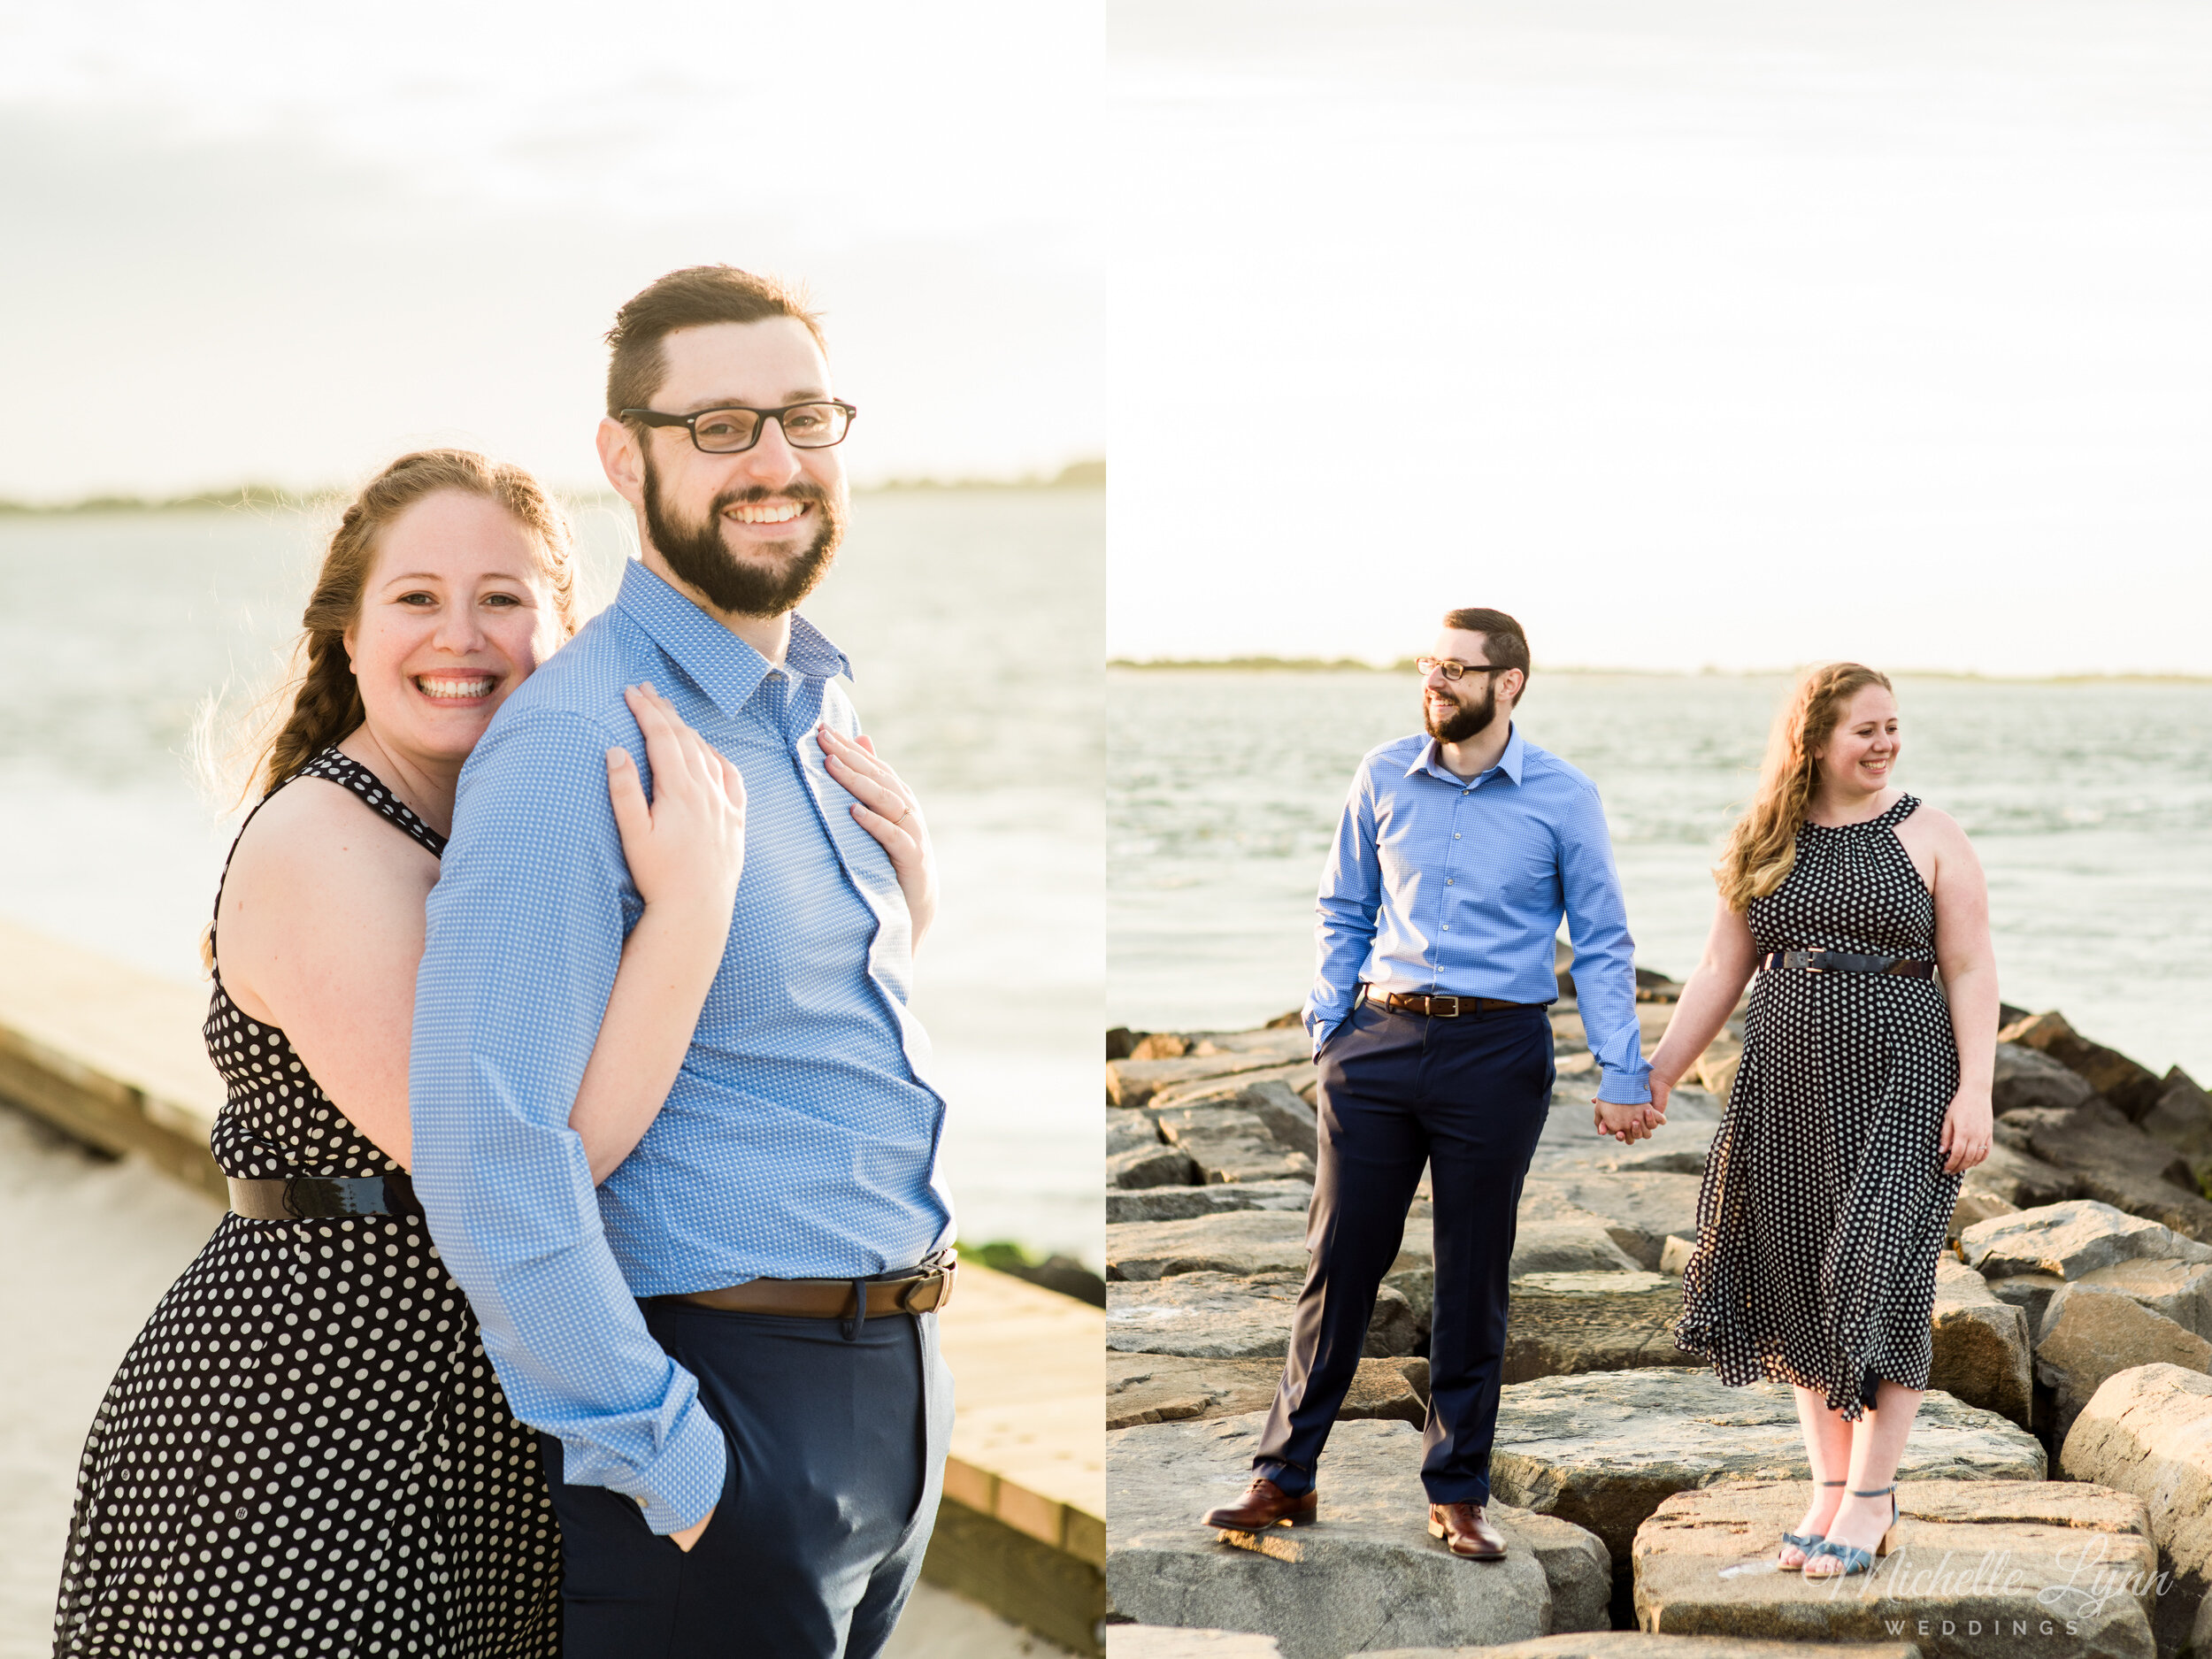 barnegat-lighthouse-engagement-photos-michelle-lynn-weddings-15.jpg